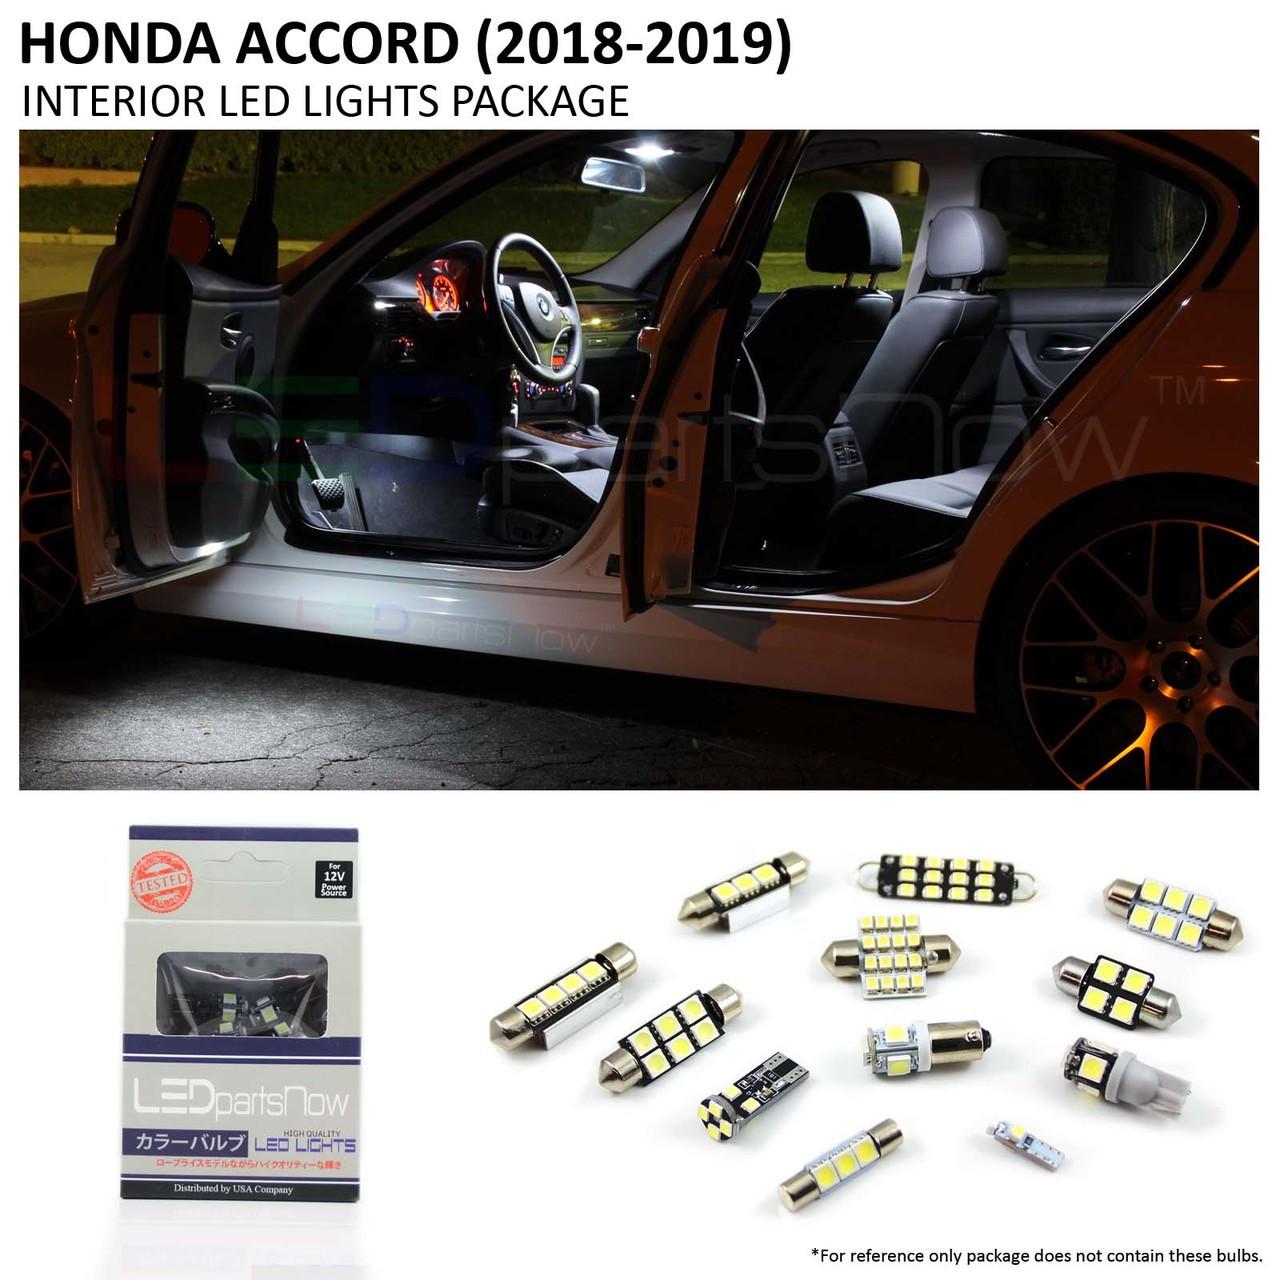 2018 Honda Accord Interior Led Lights Package